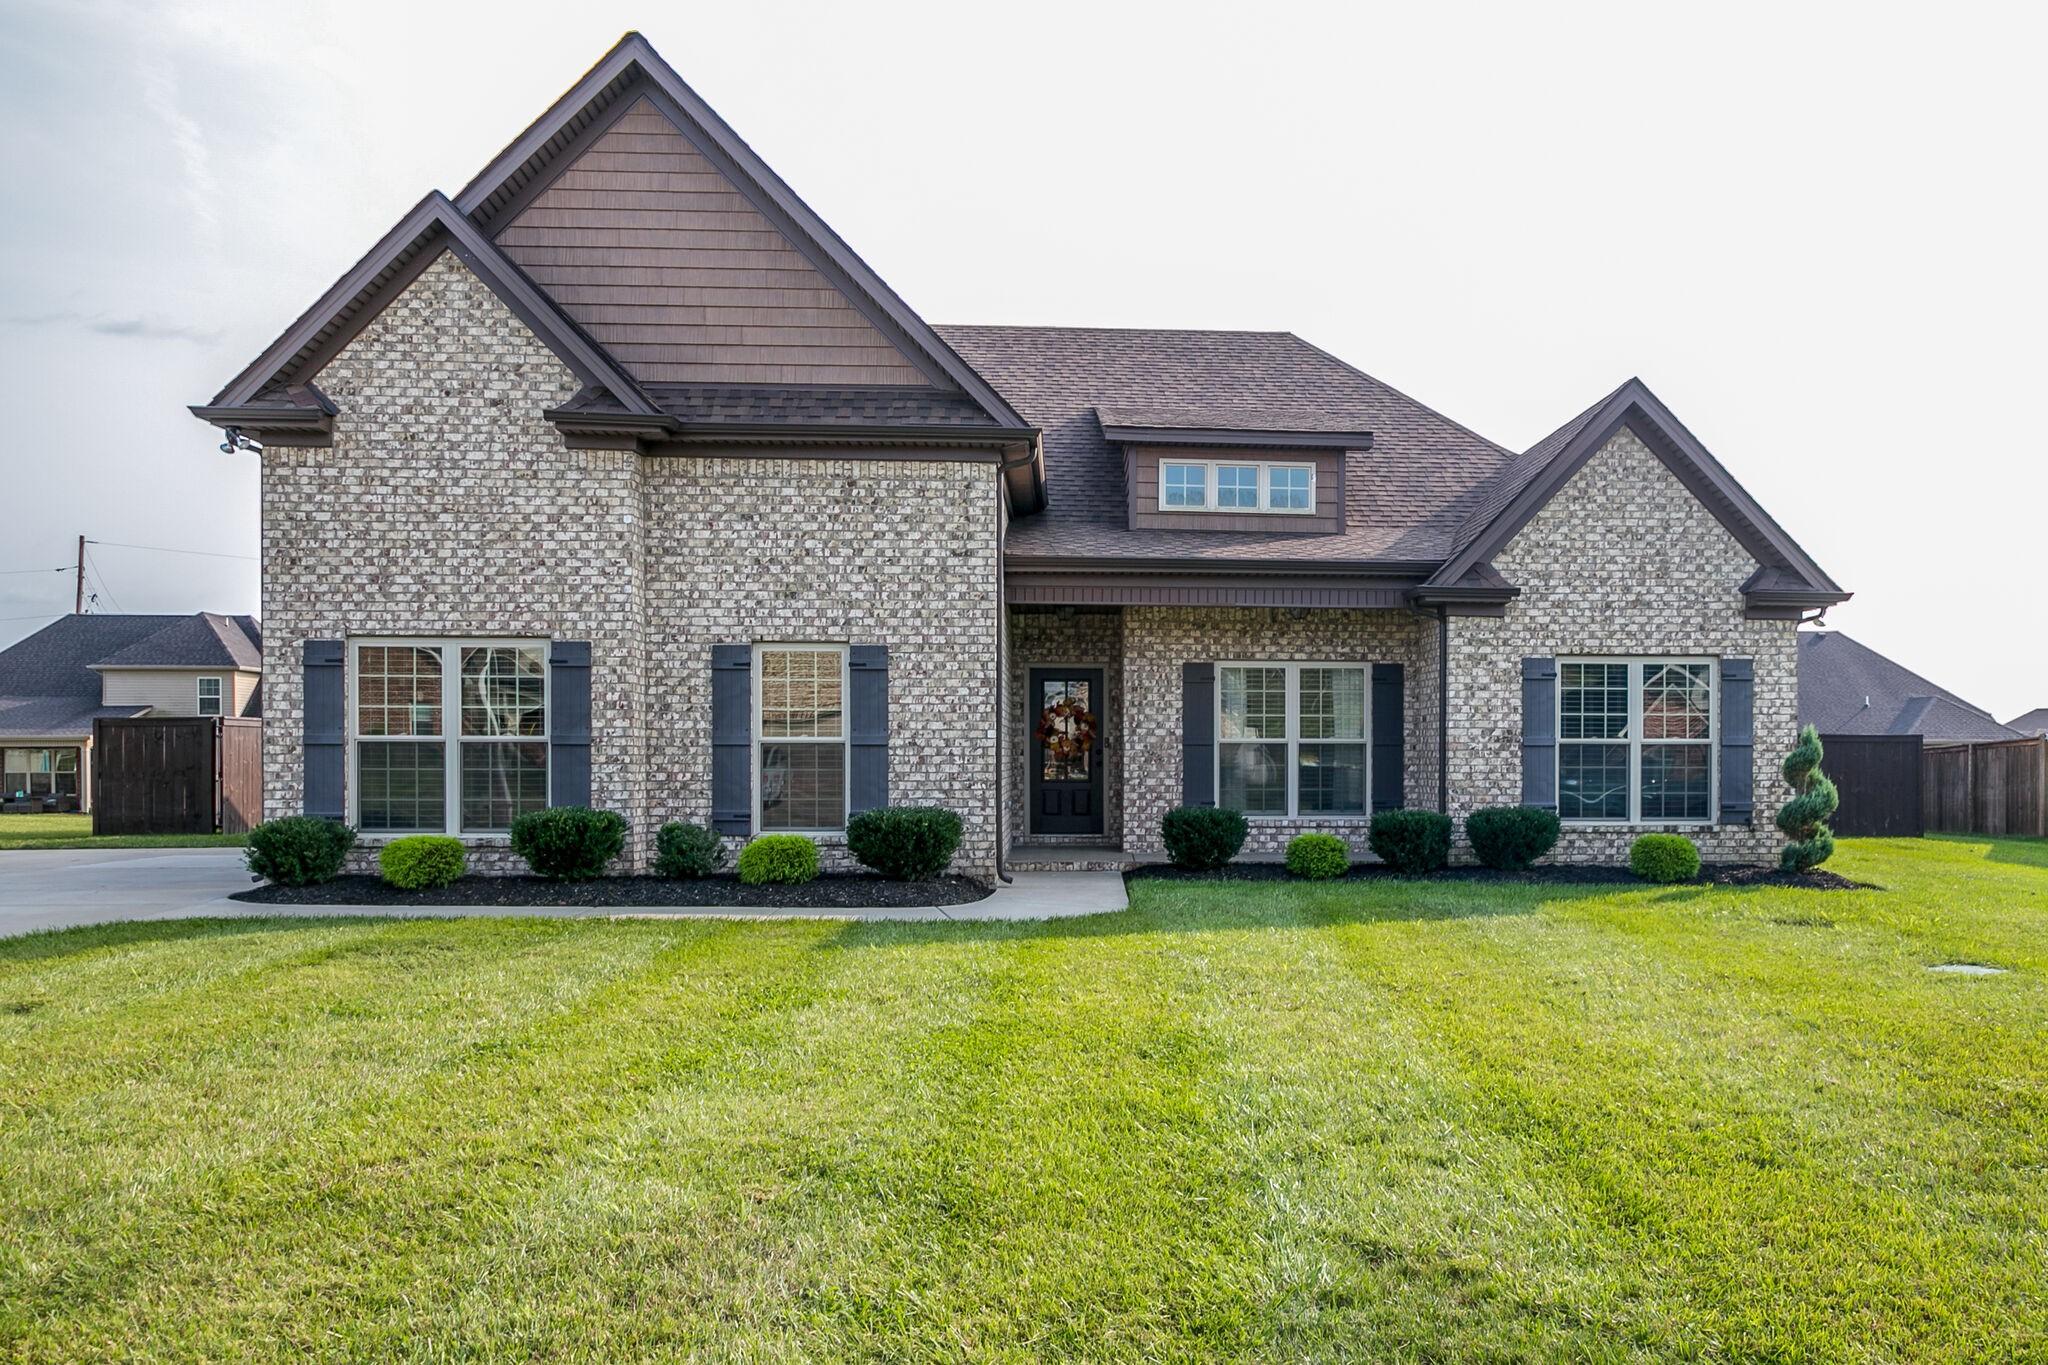 206 Cora Beth Ct Property Photo - Lascassas, TN real estate listing